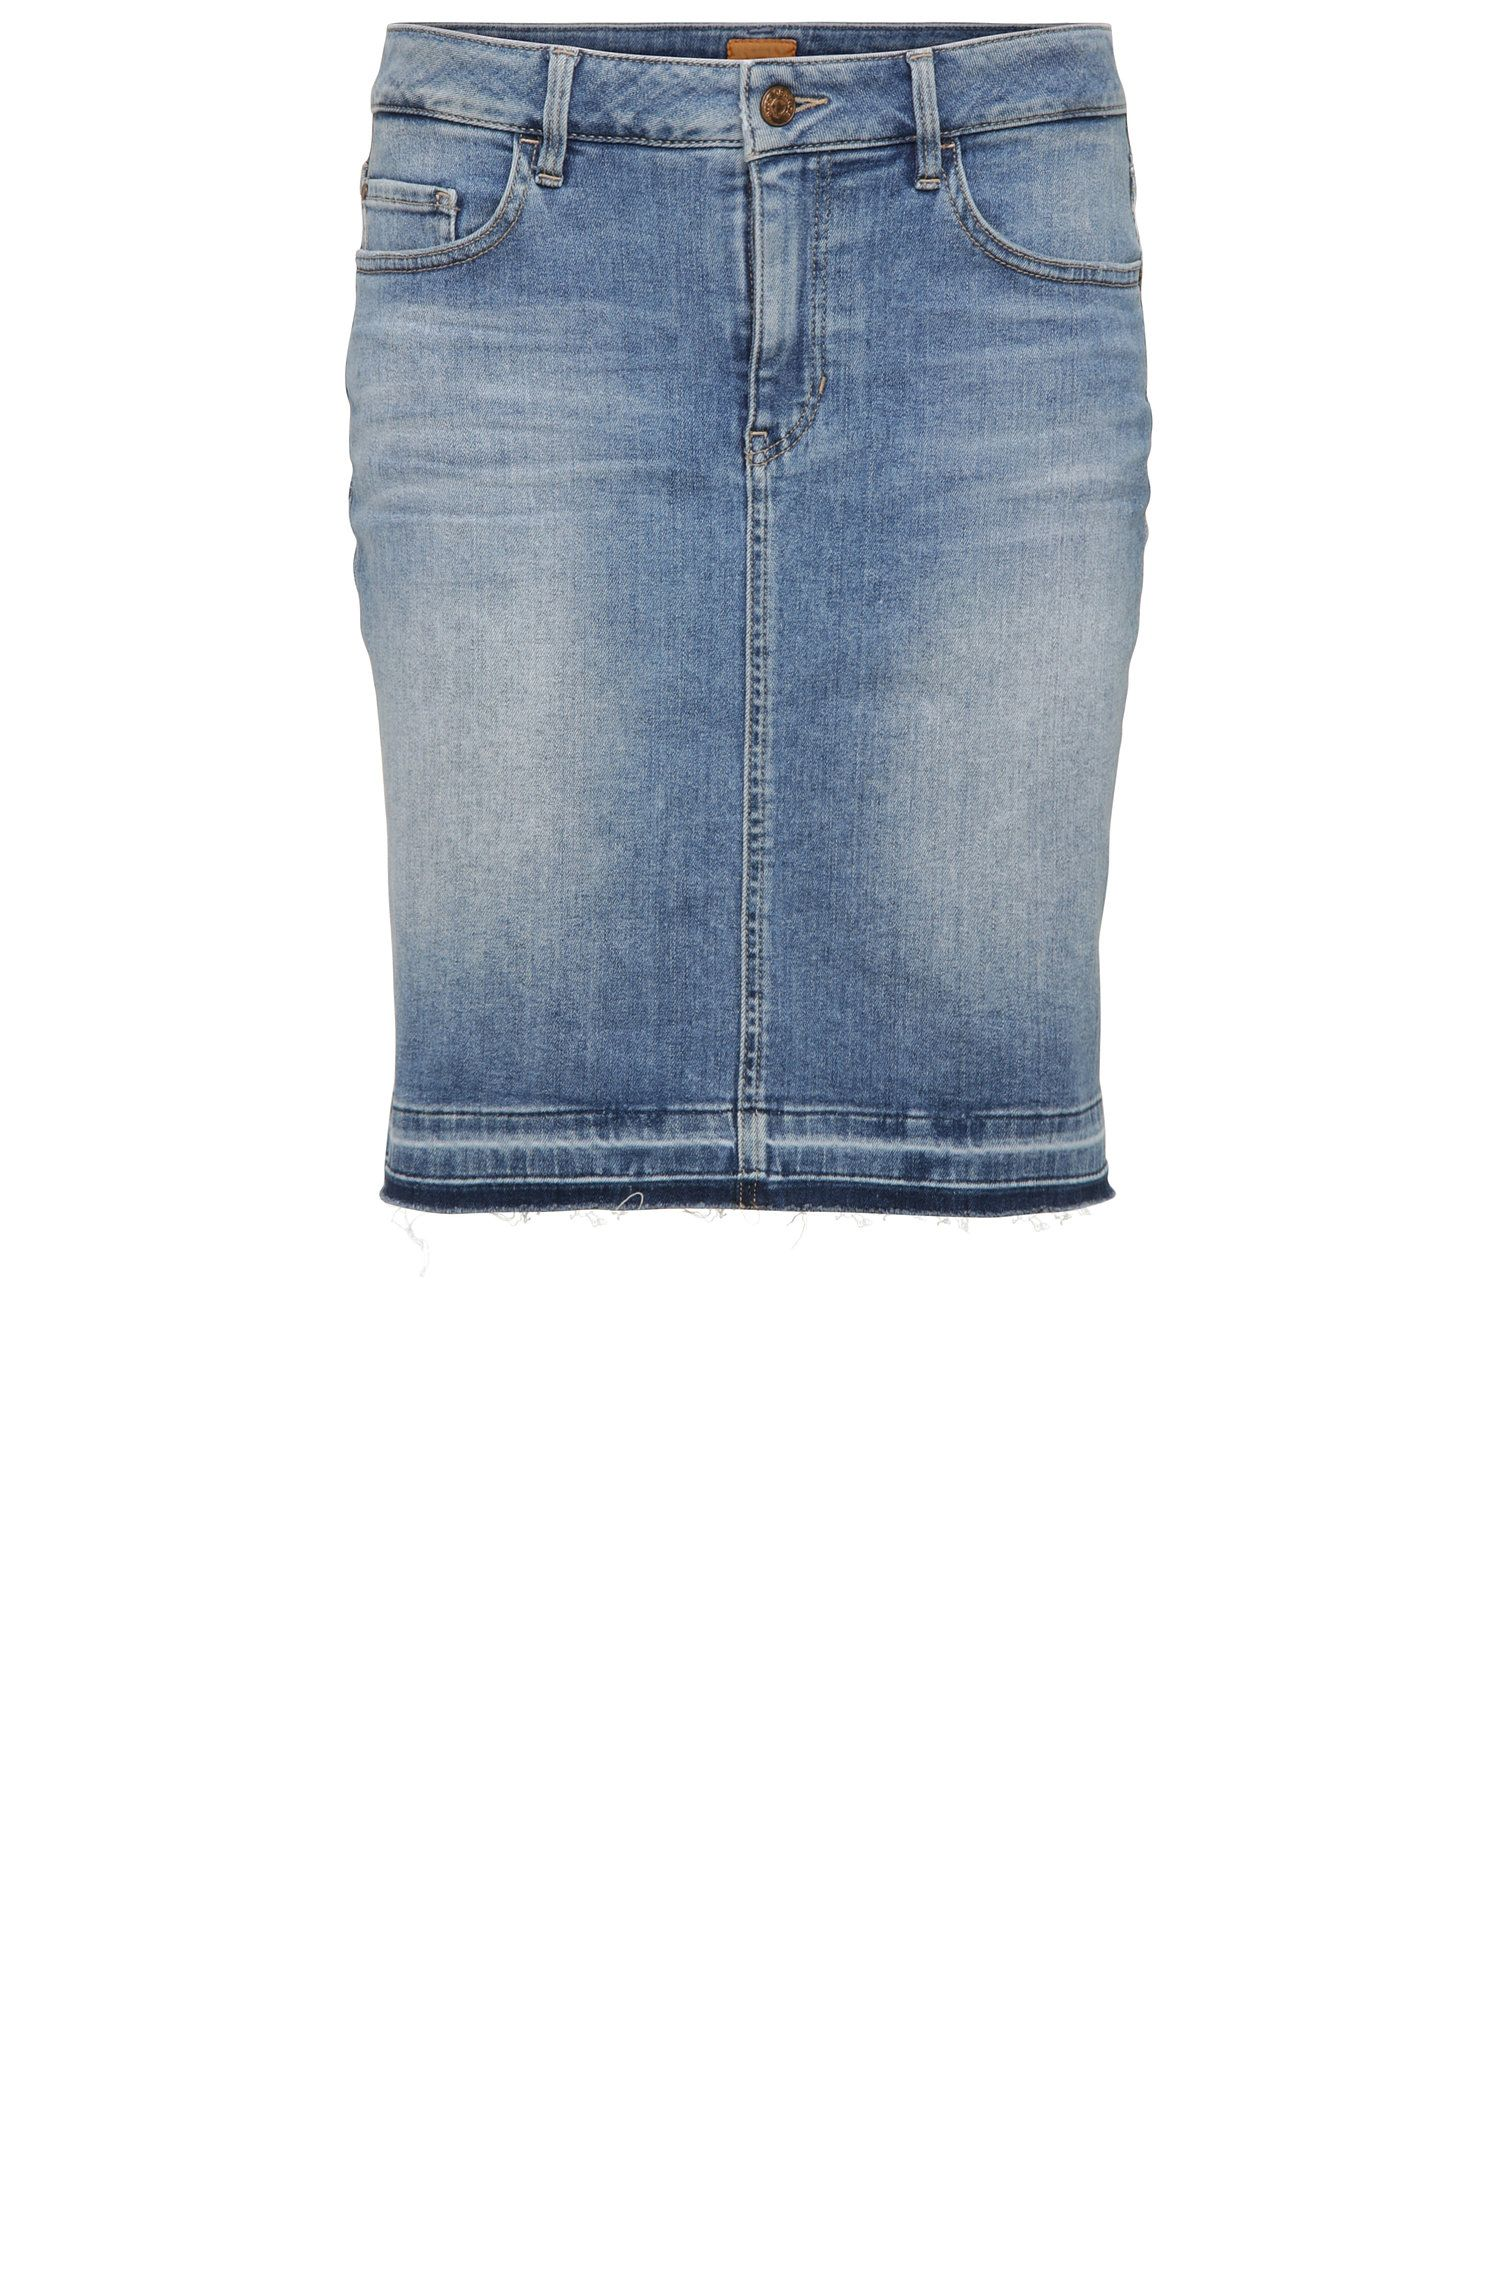 Short jeans skirt in stretchy cotton blend: 'Orange J90 Newark'